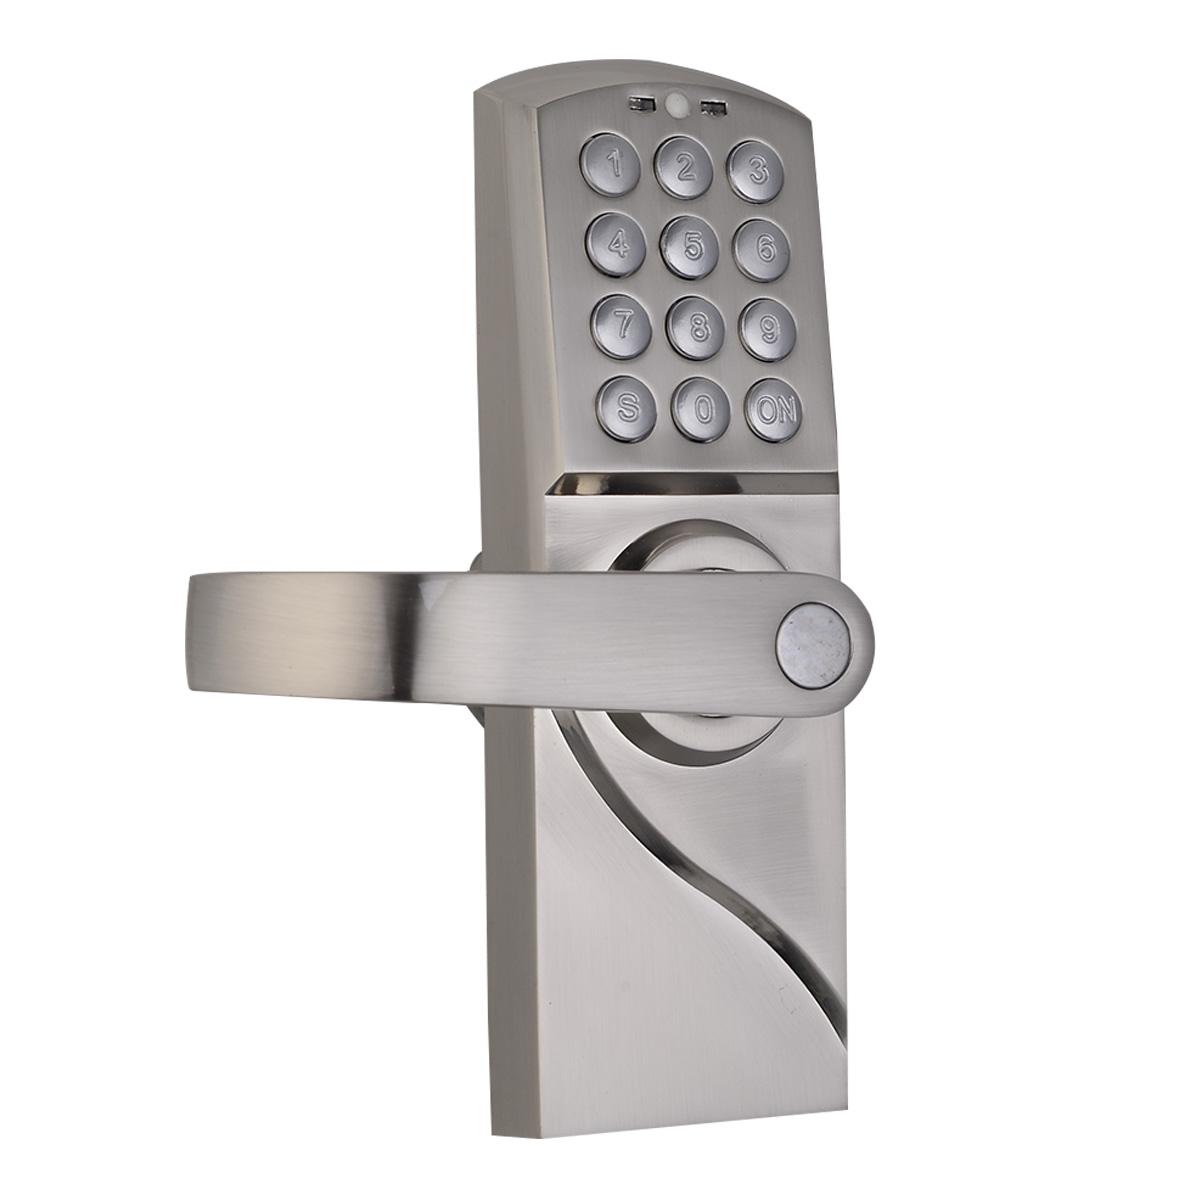 door knob with key lock photo - 11